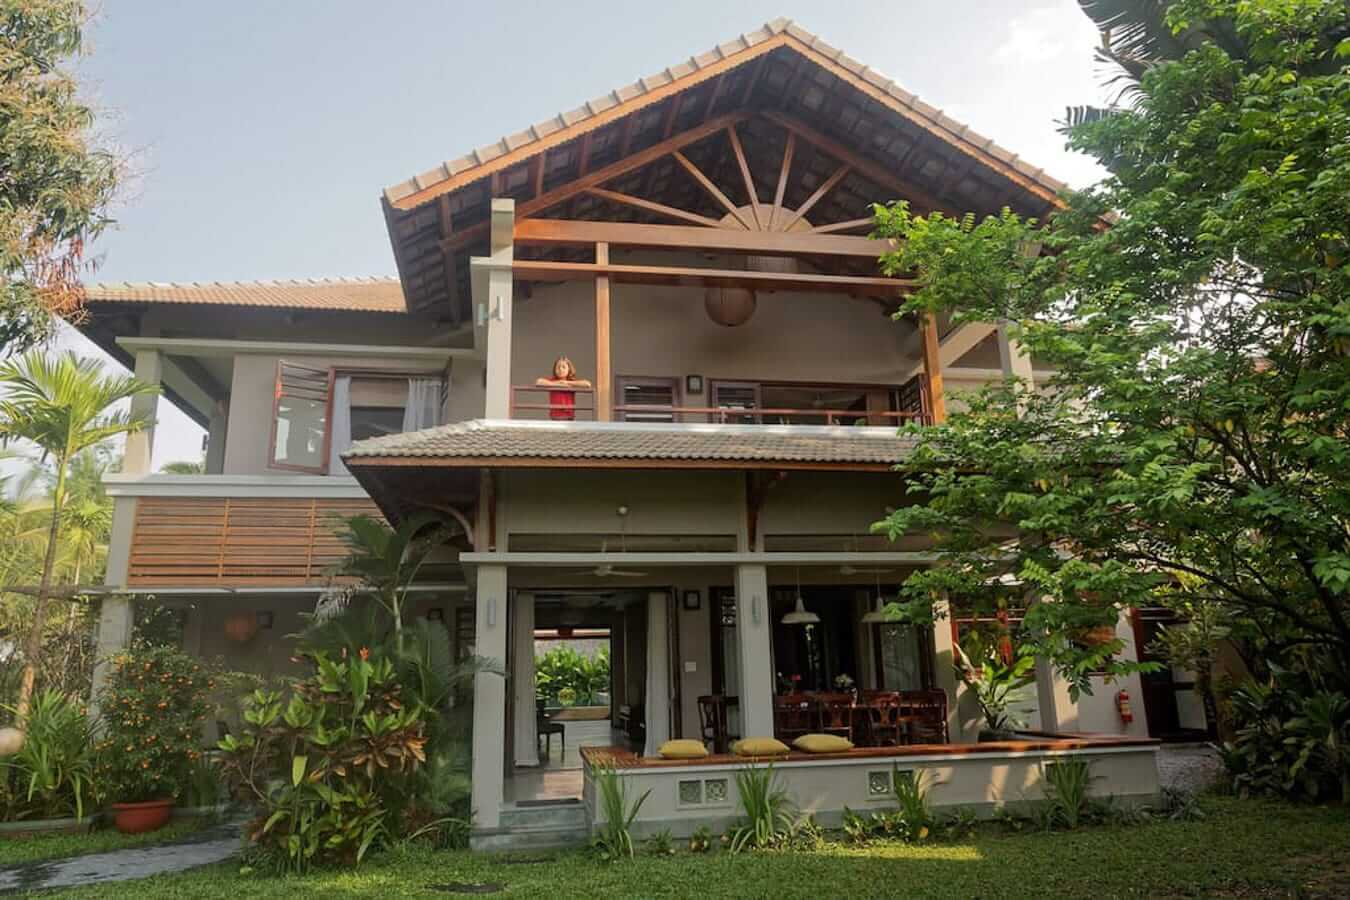 Annica Villa in Hoi An